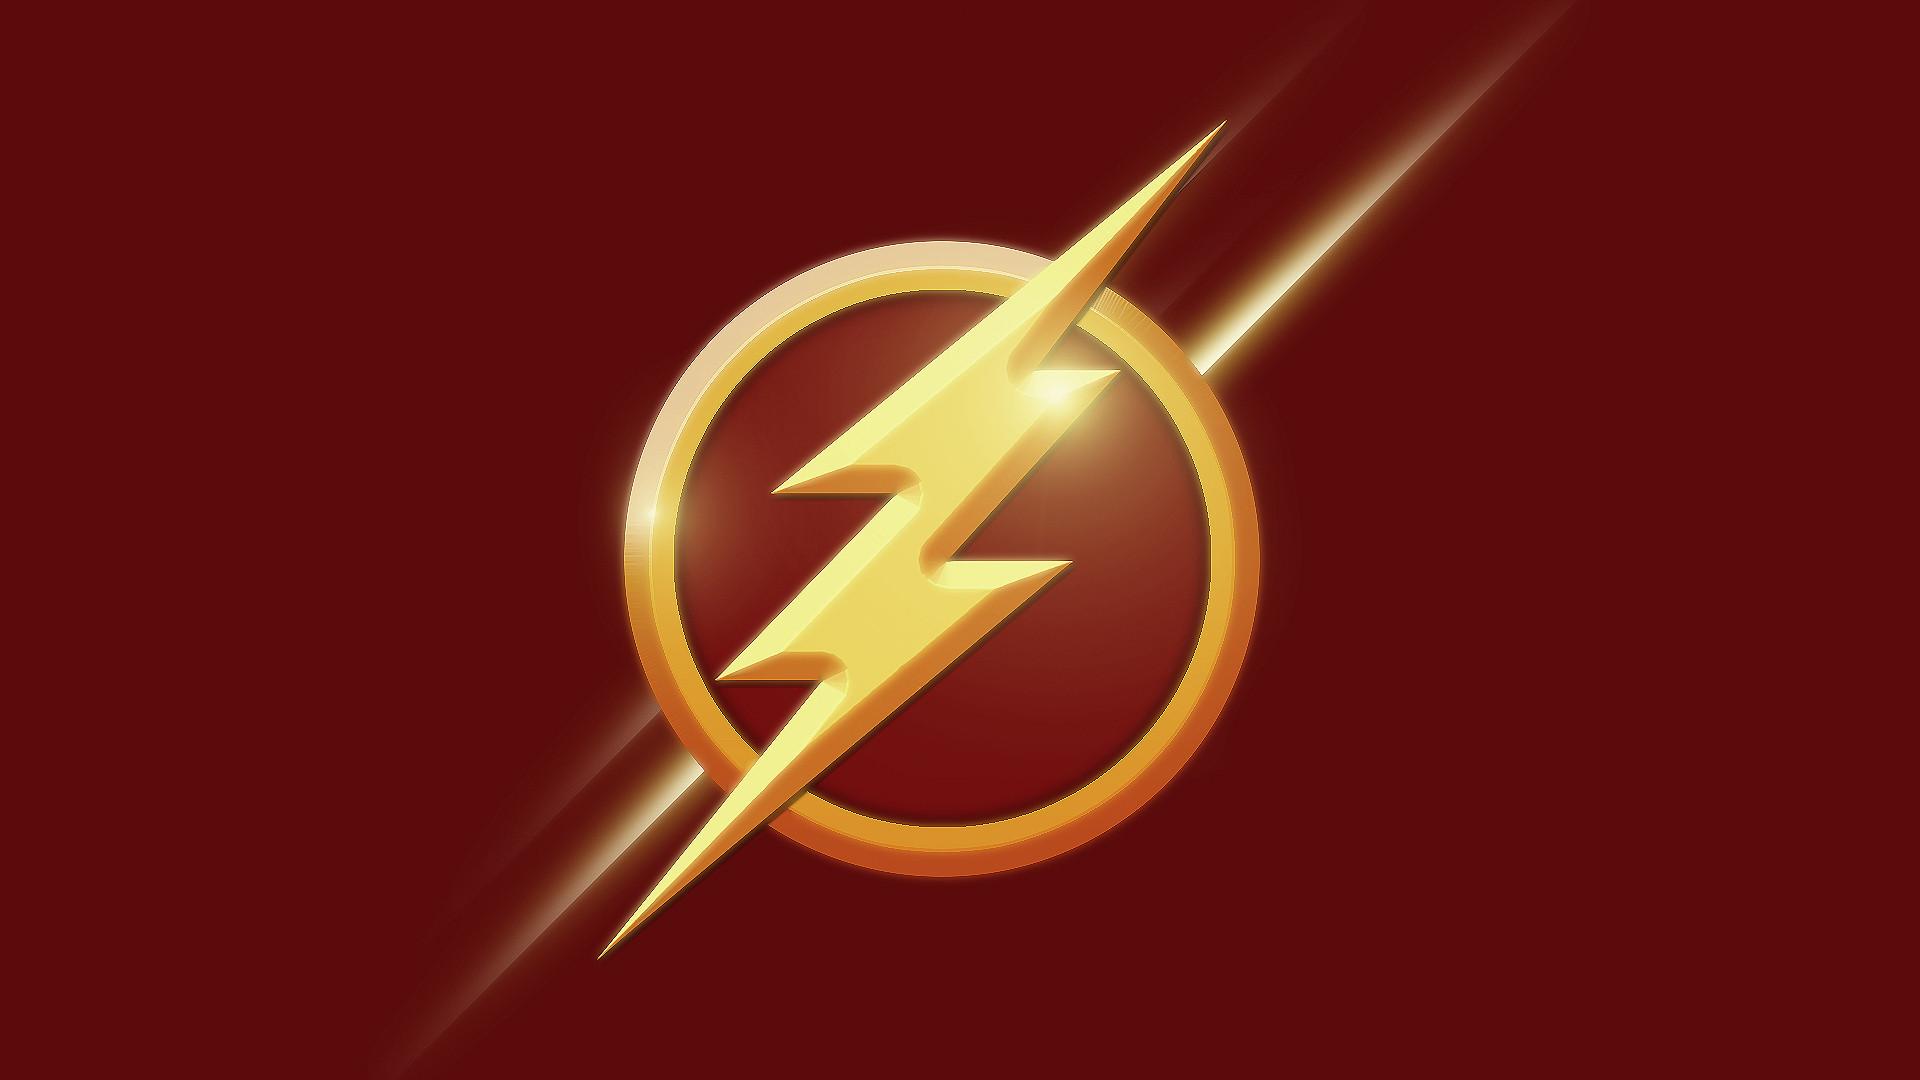 The Flash Iphone Wallpaper hd Iphone Wallpaper hd Flash